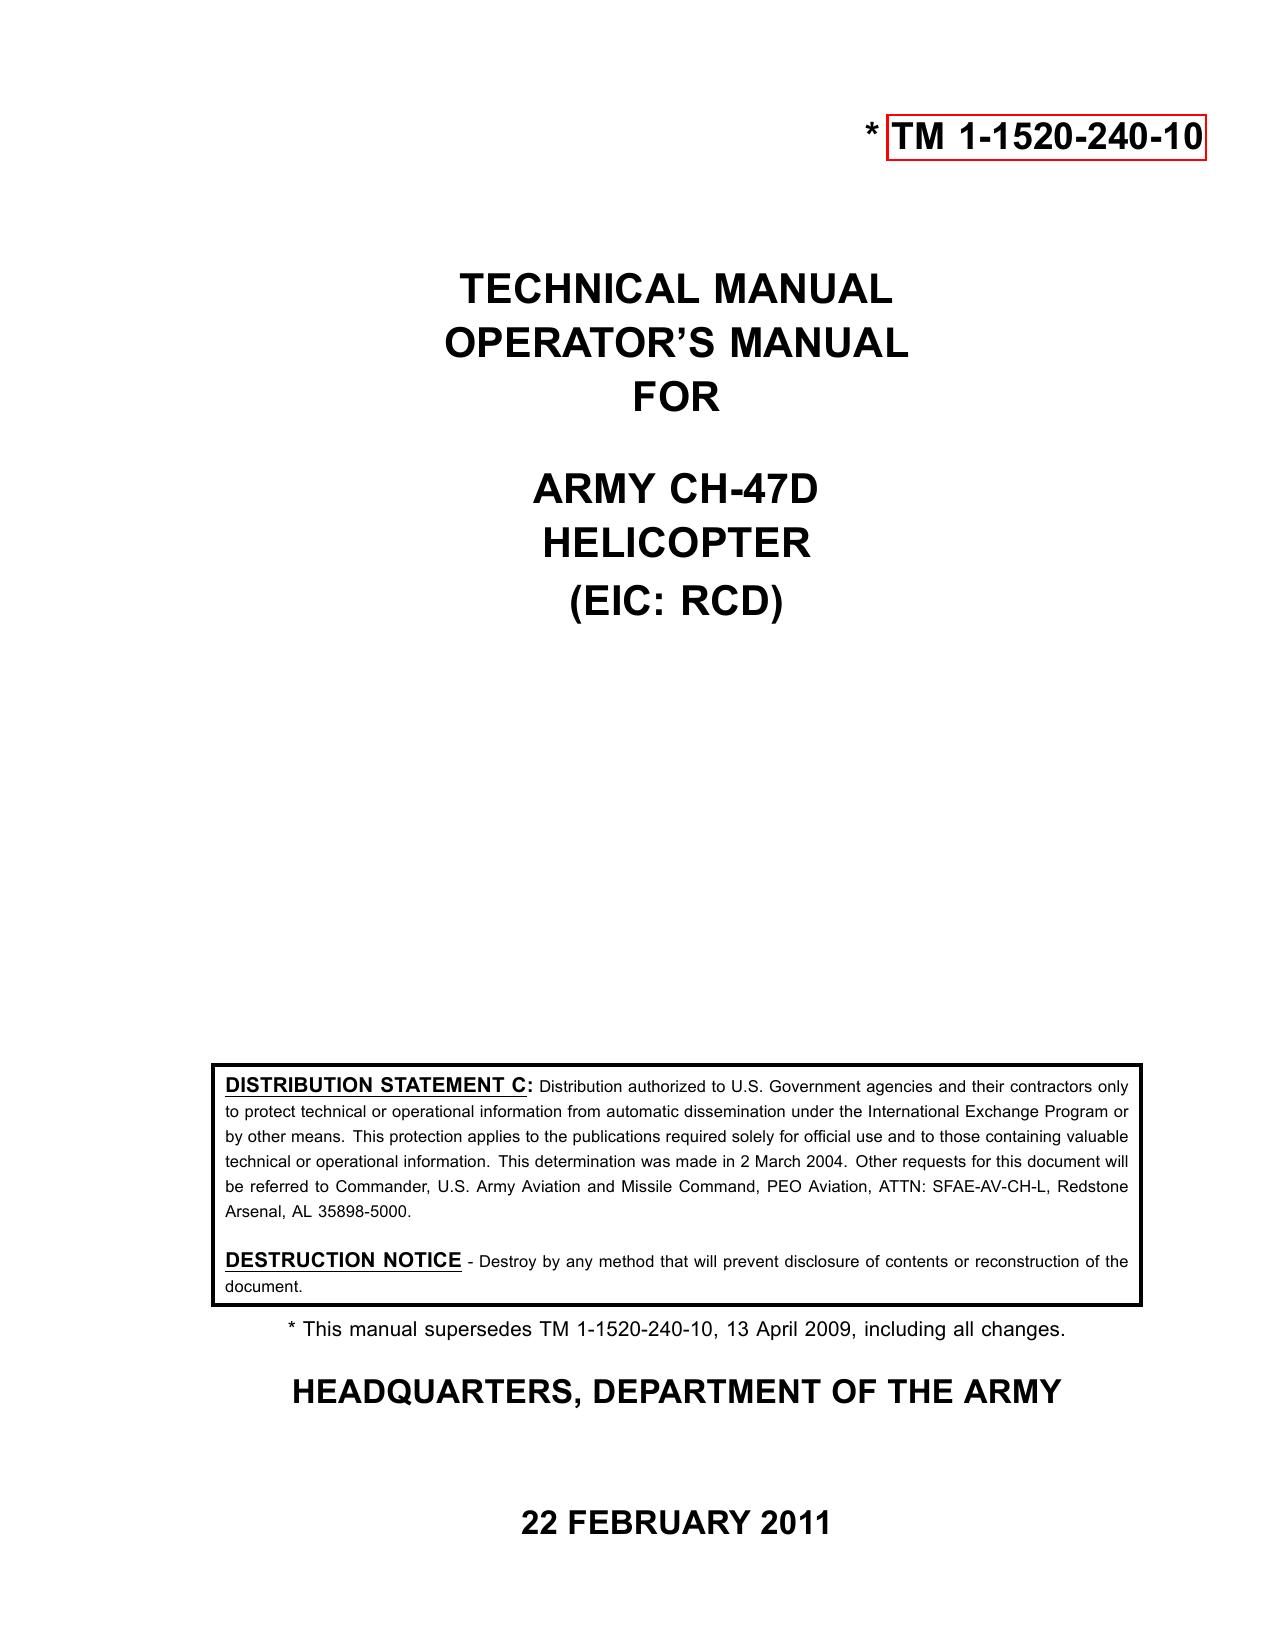 CH-47D ARMY OPERATORS MANUAL